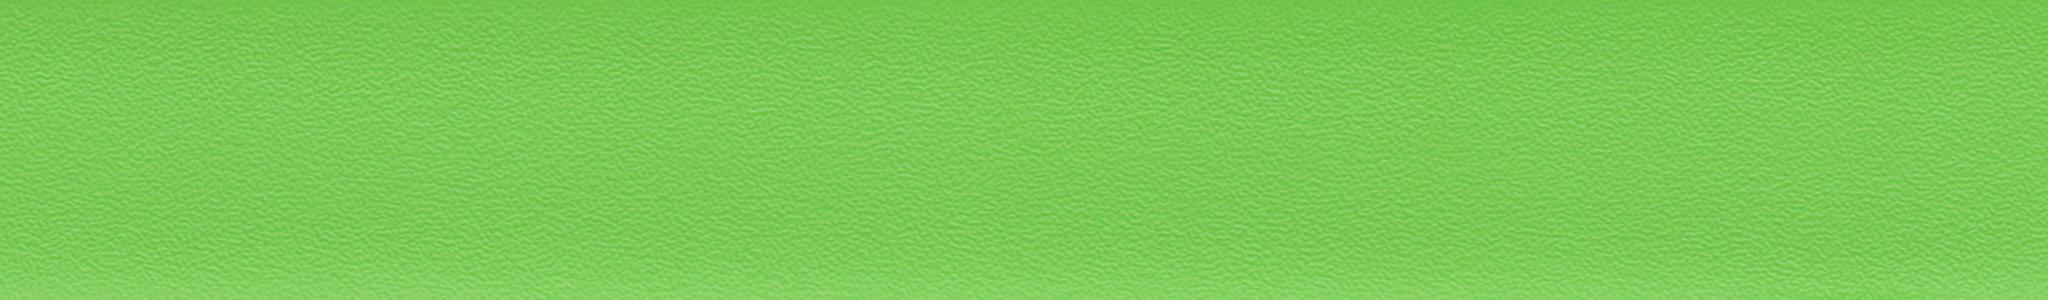 HU 16018 ABS hrana zelená perla 101